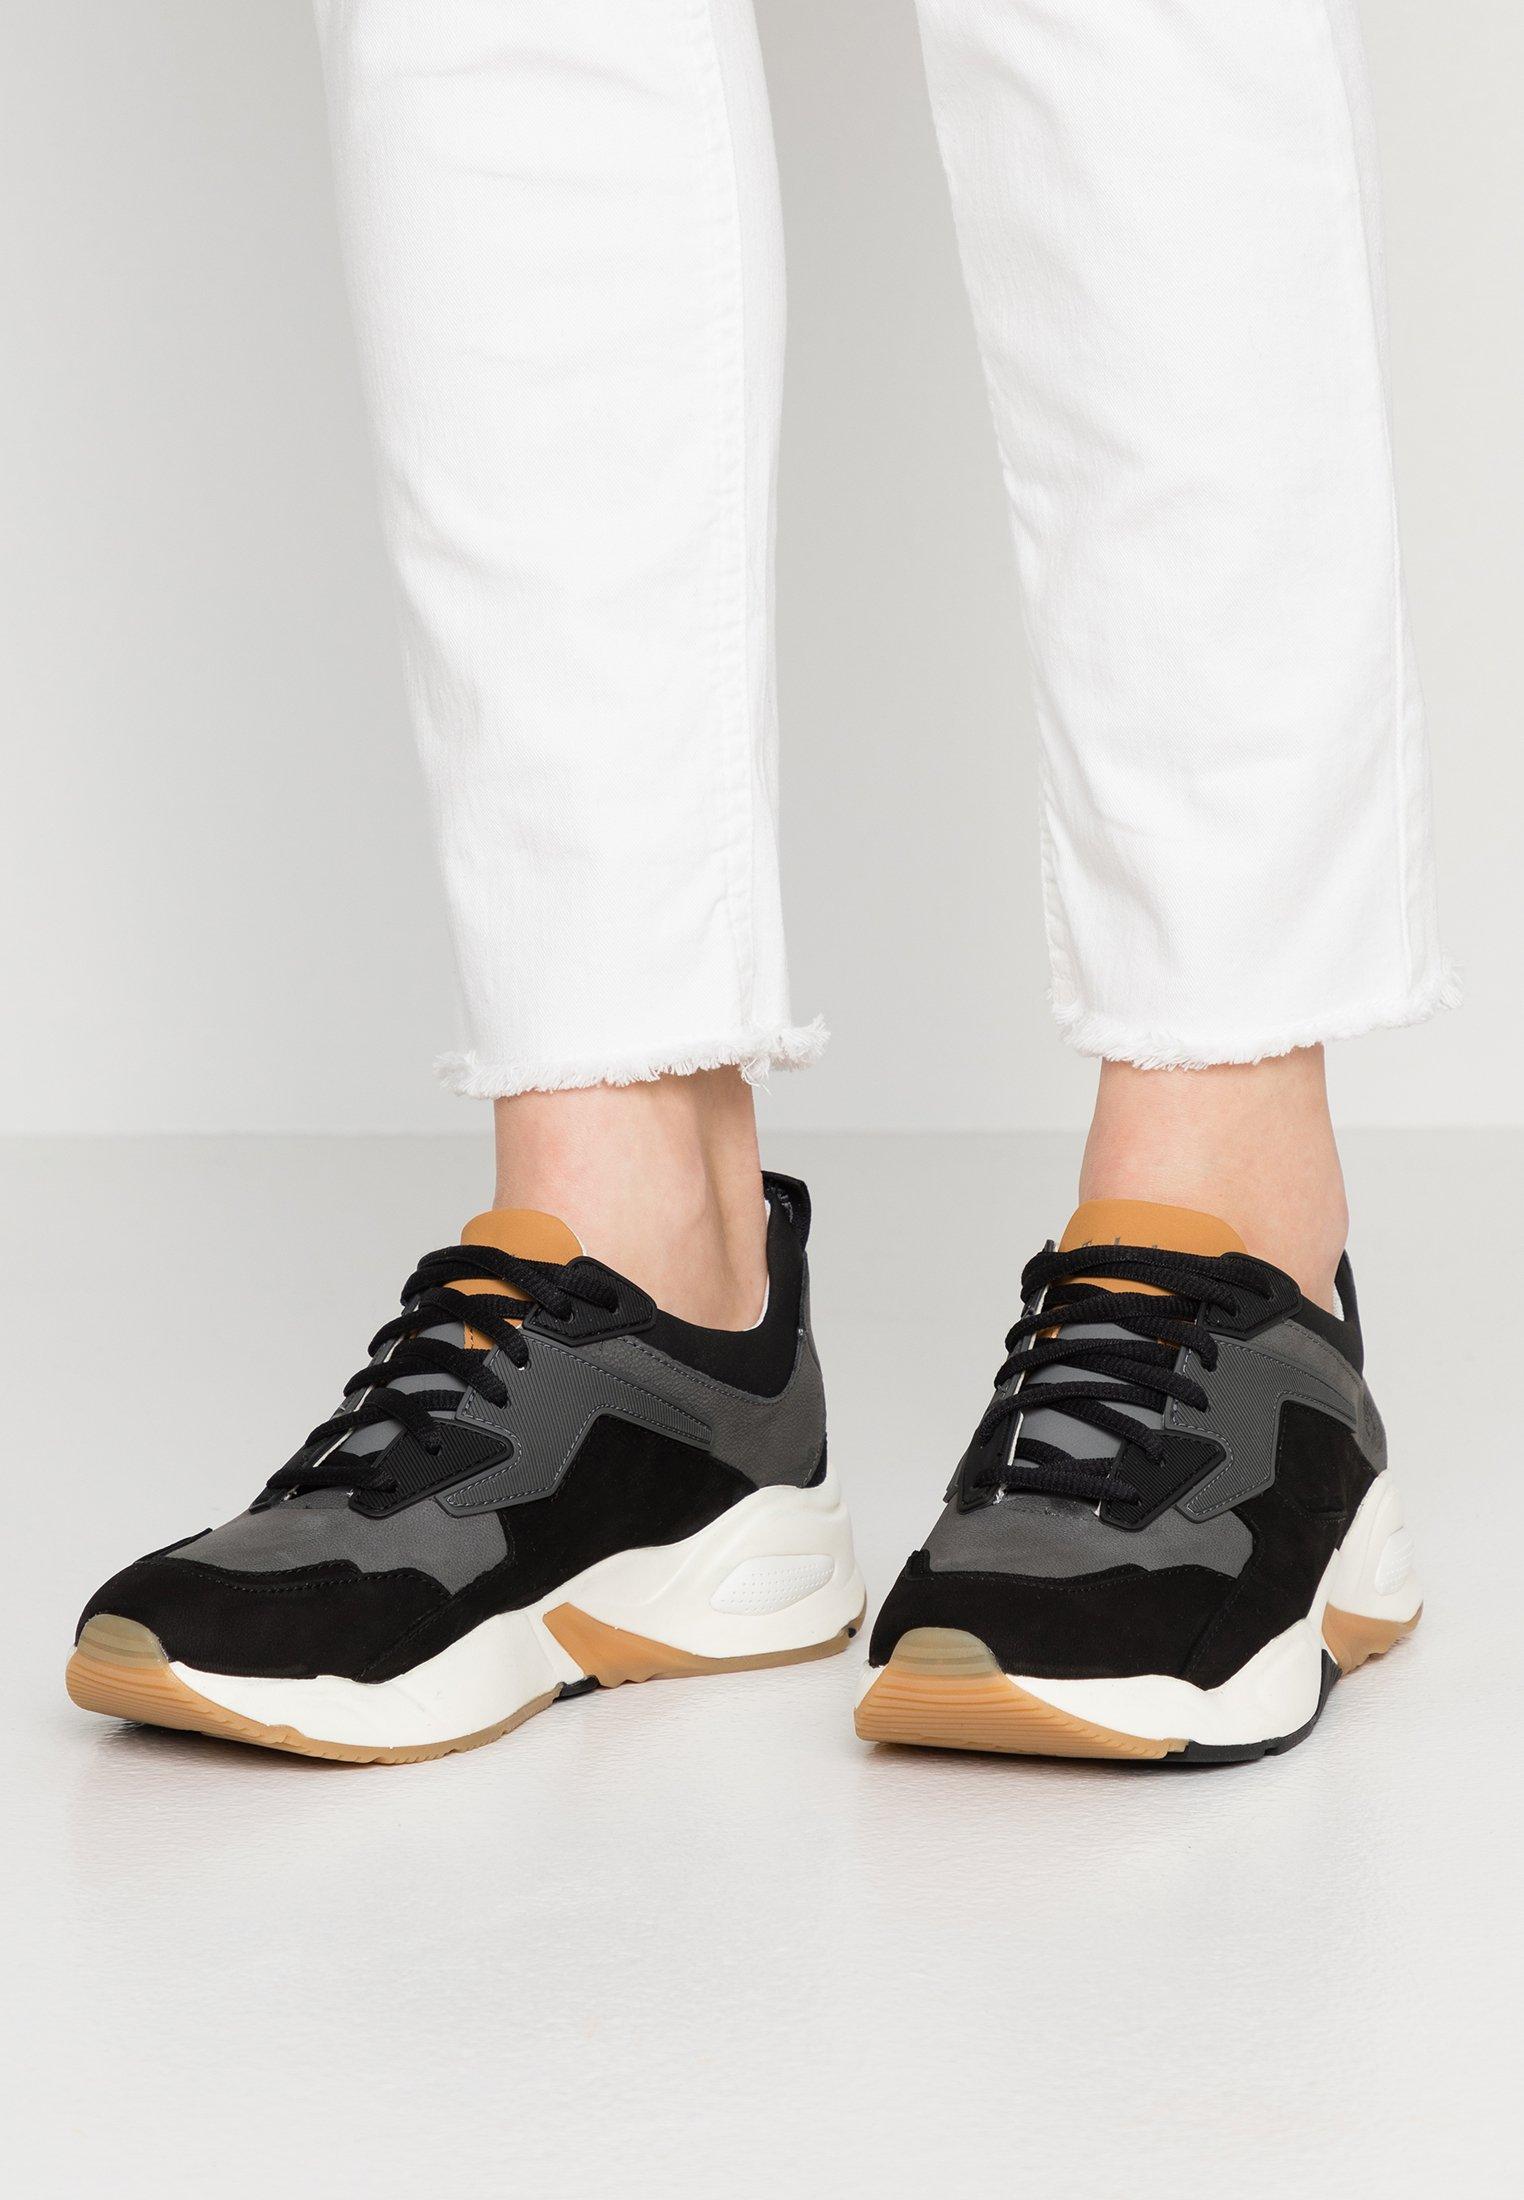 DELPHIVILLE Sneakers black